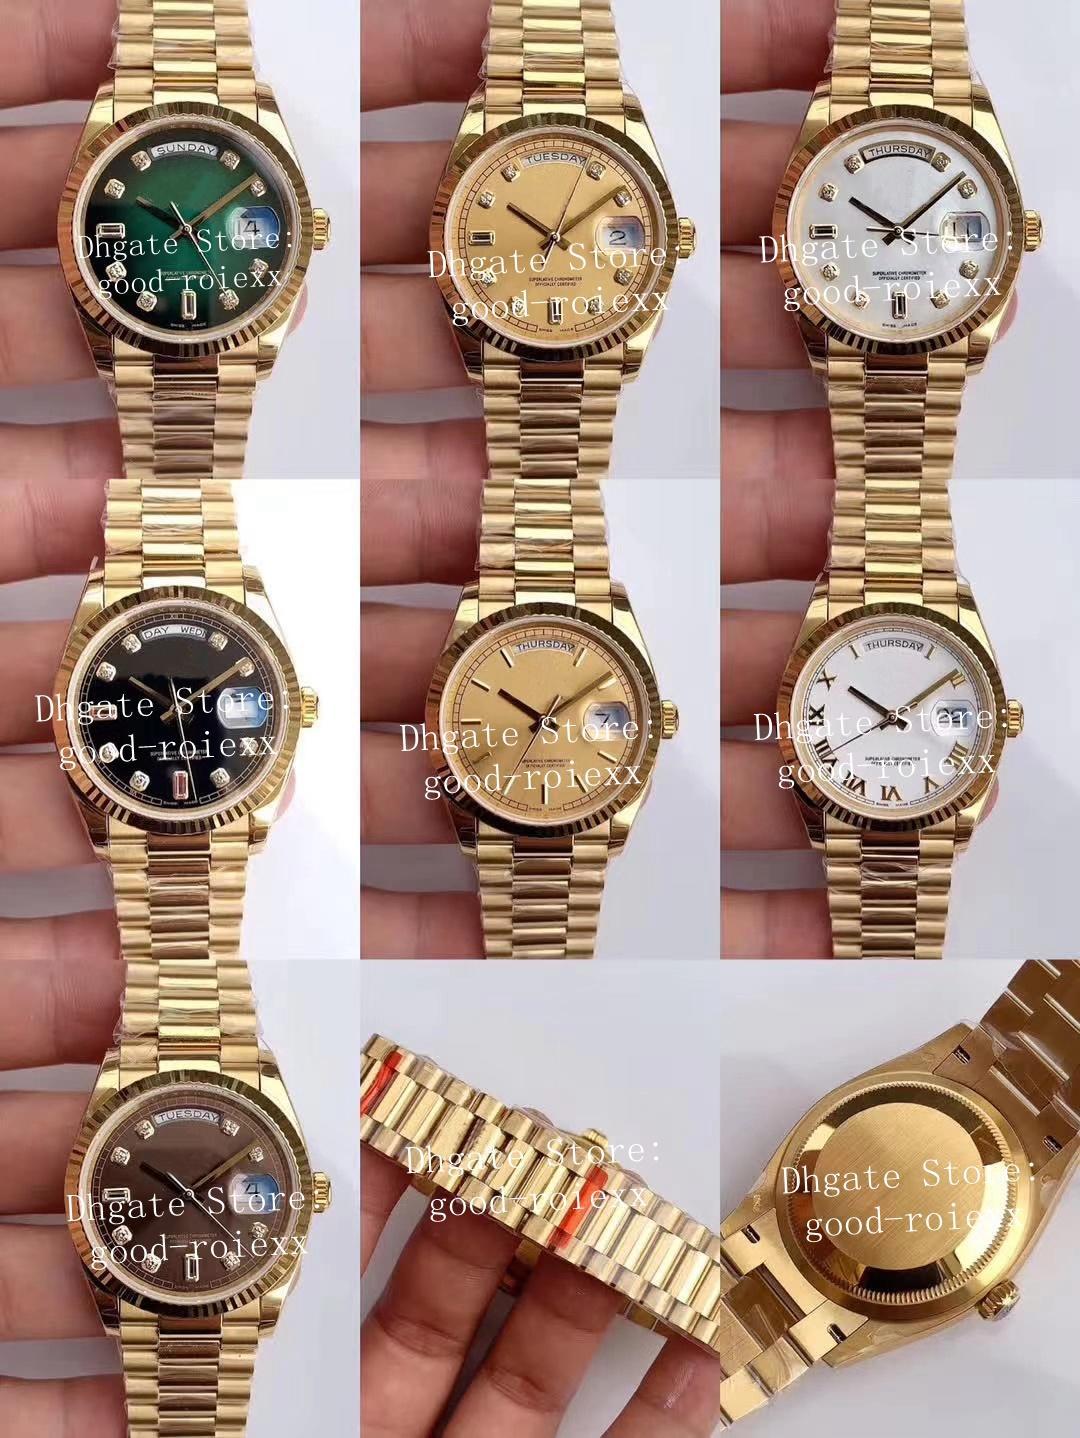 9 estilo Unisex Midsize relógios Mens automático Cal.3255 Watch's Watch Yellow Gold Ladies Data 128238 homens EW Fábrica ETA 36mm relógios de pulso